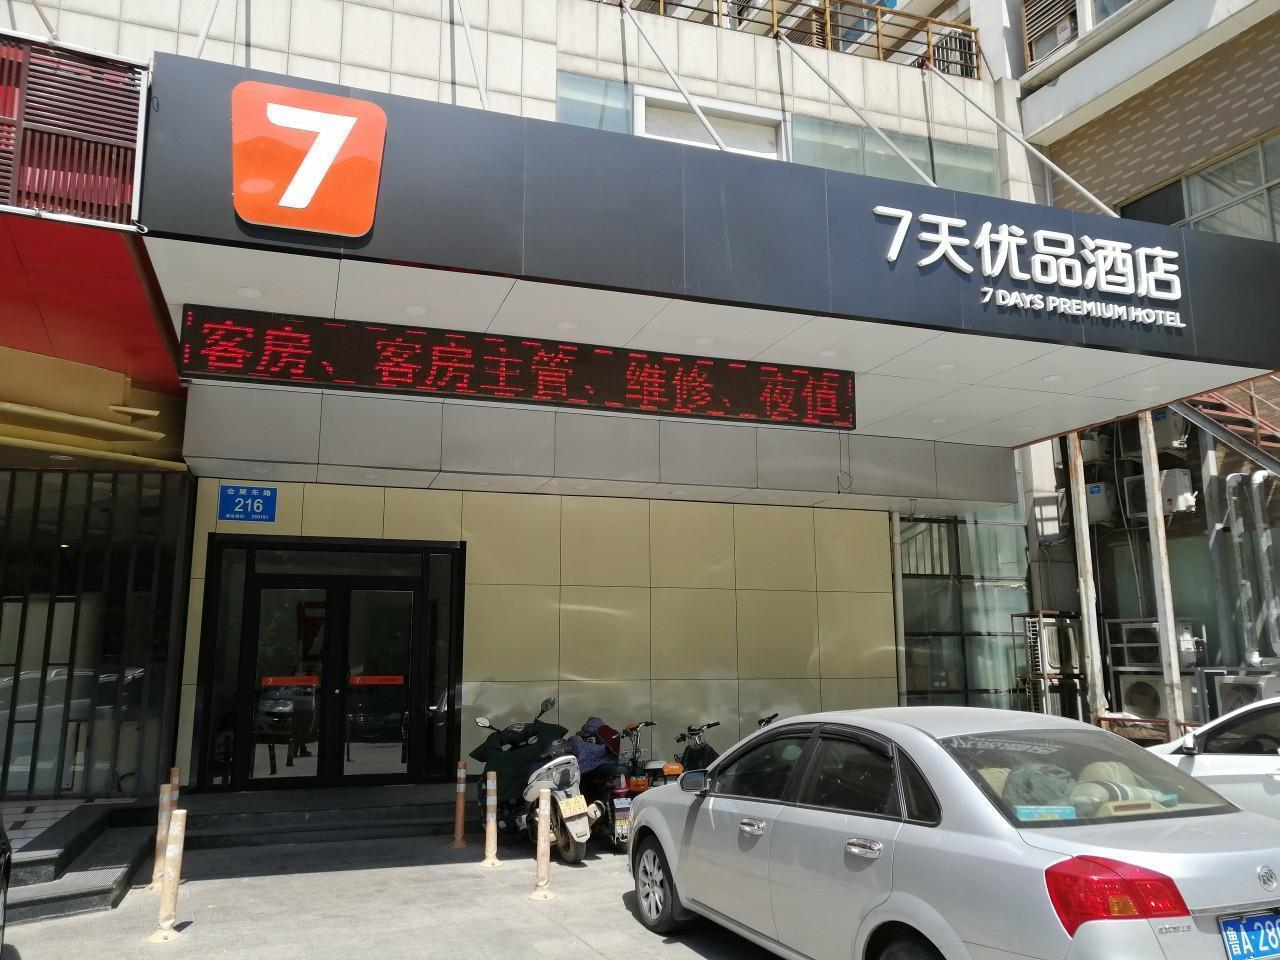 7 Days Premium Ji'nan High Tech Zone International Convention Center